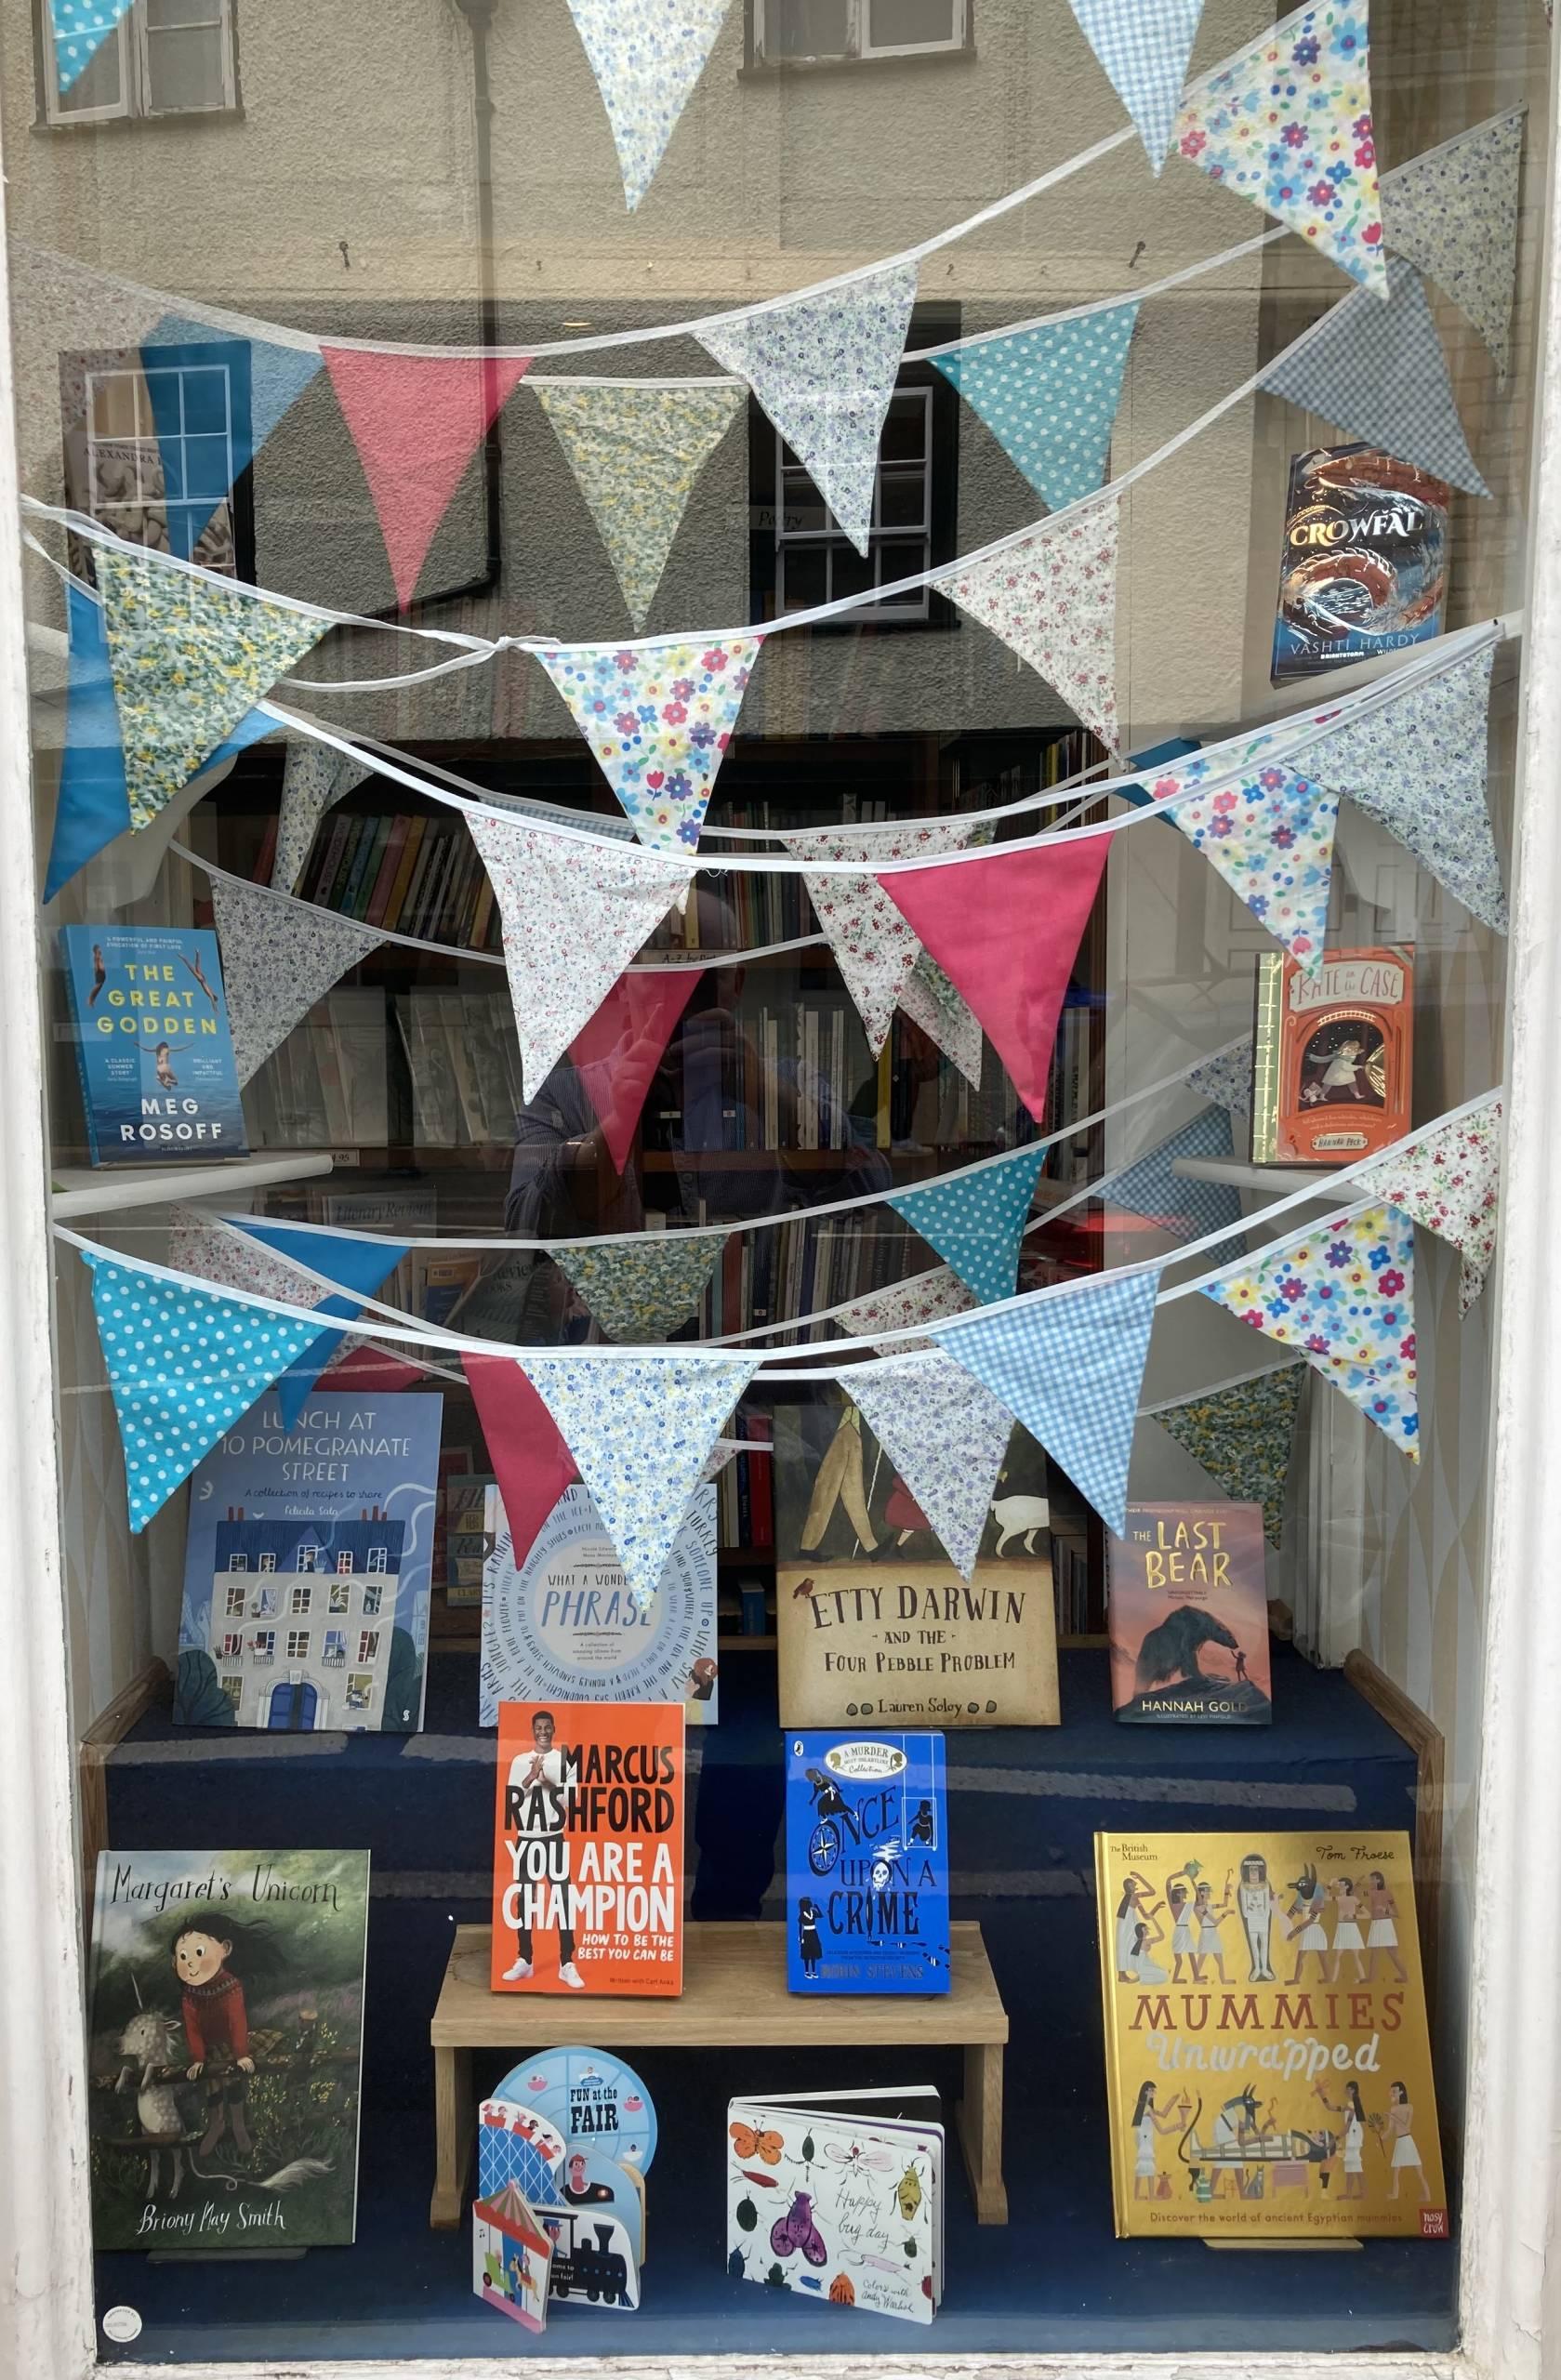 Our Tetbury Window Displays (17/08/21)